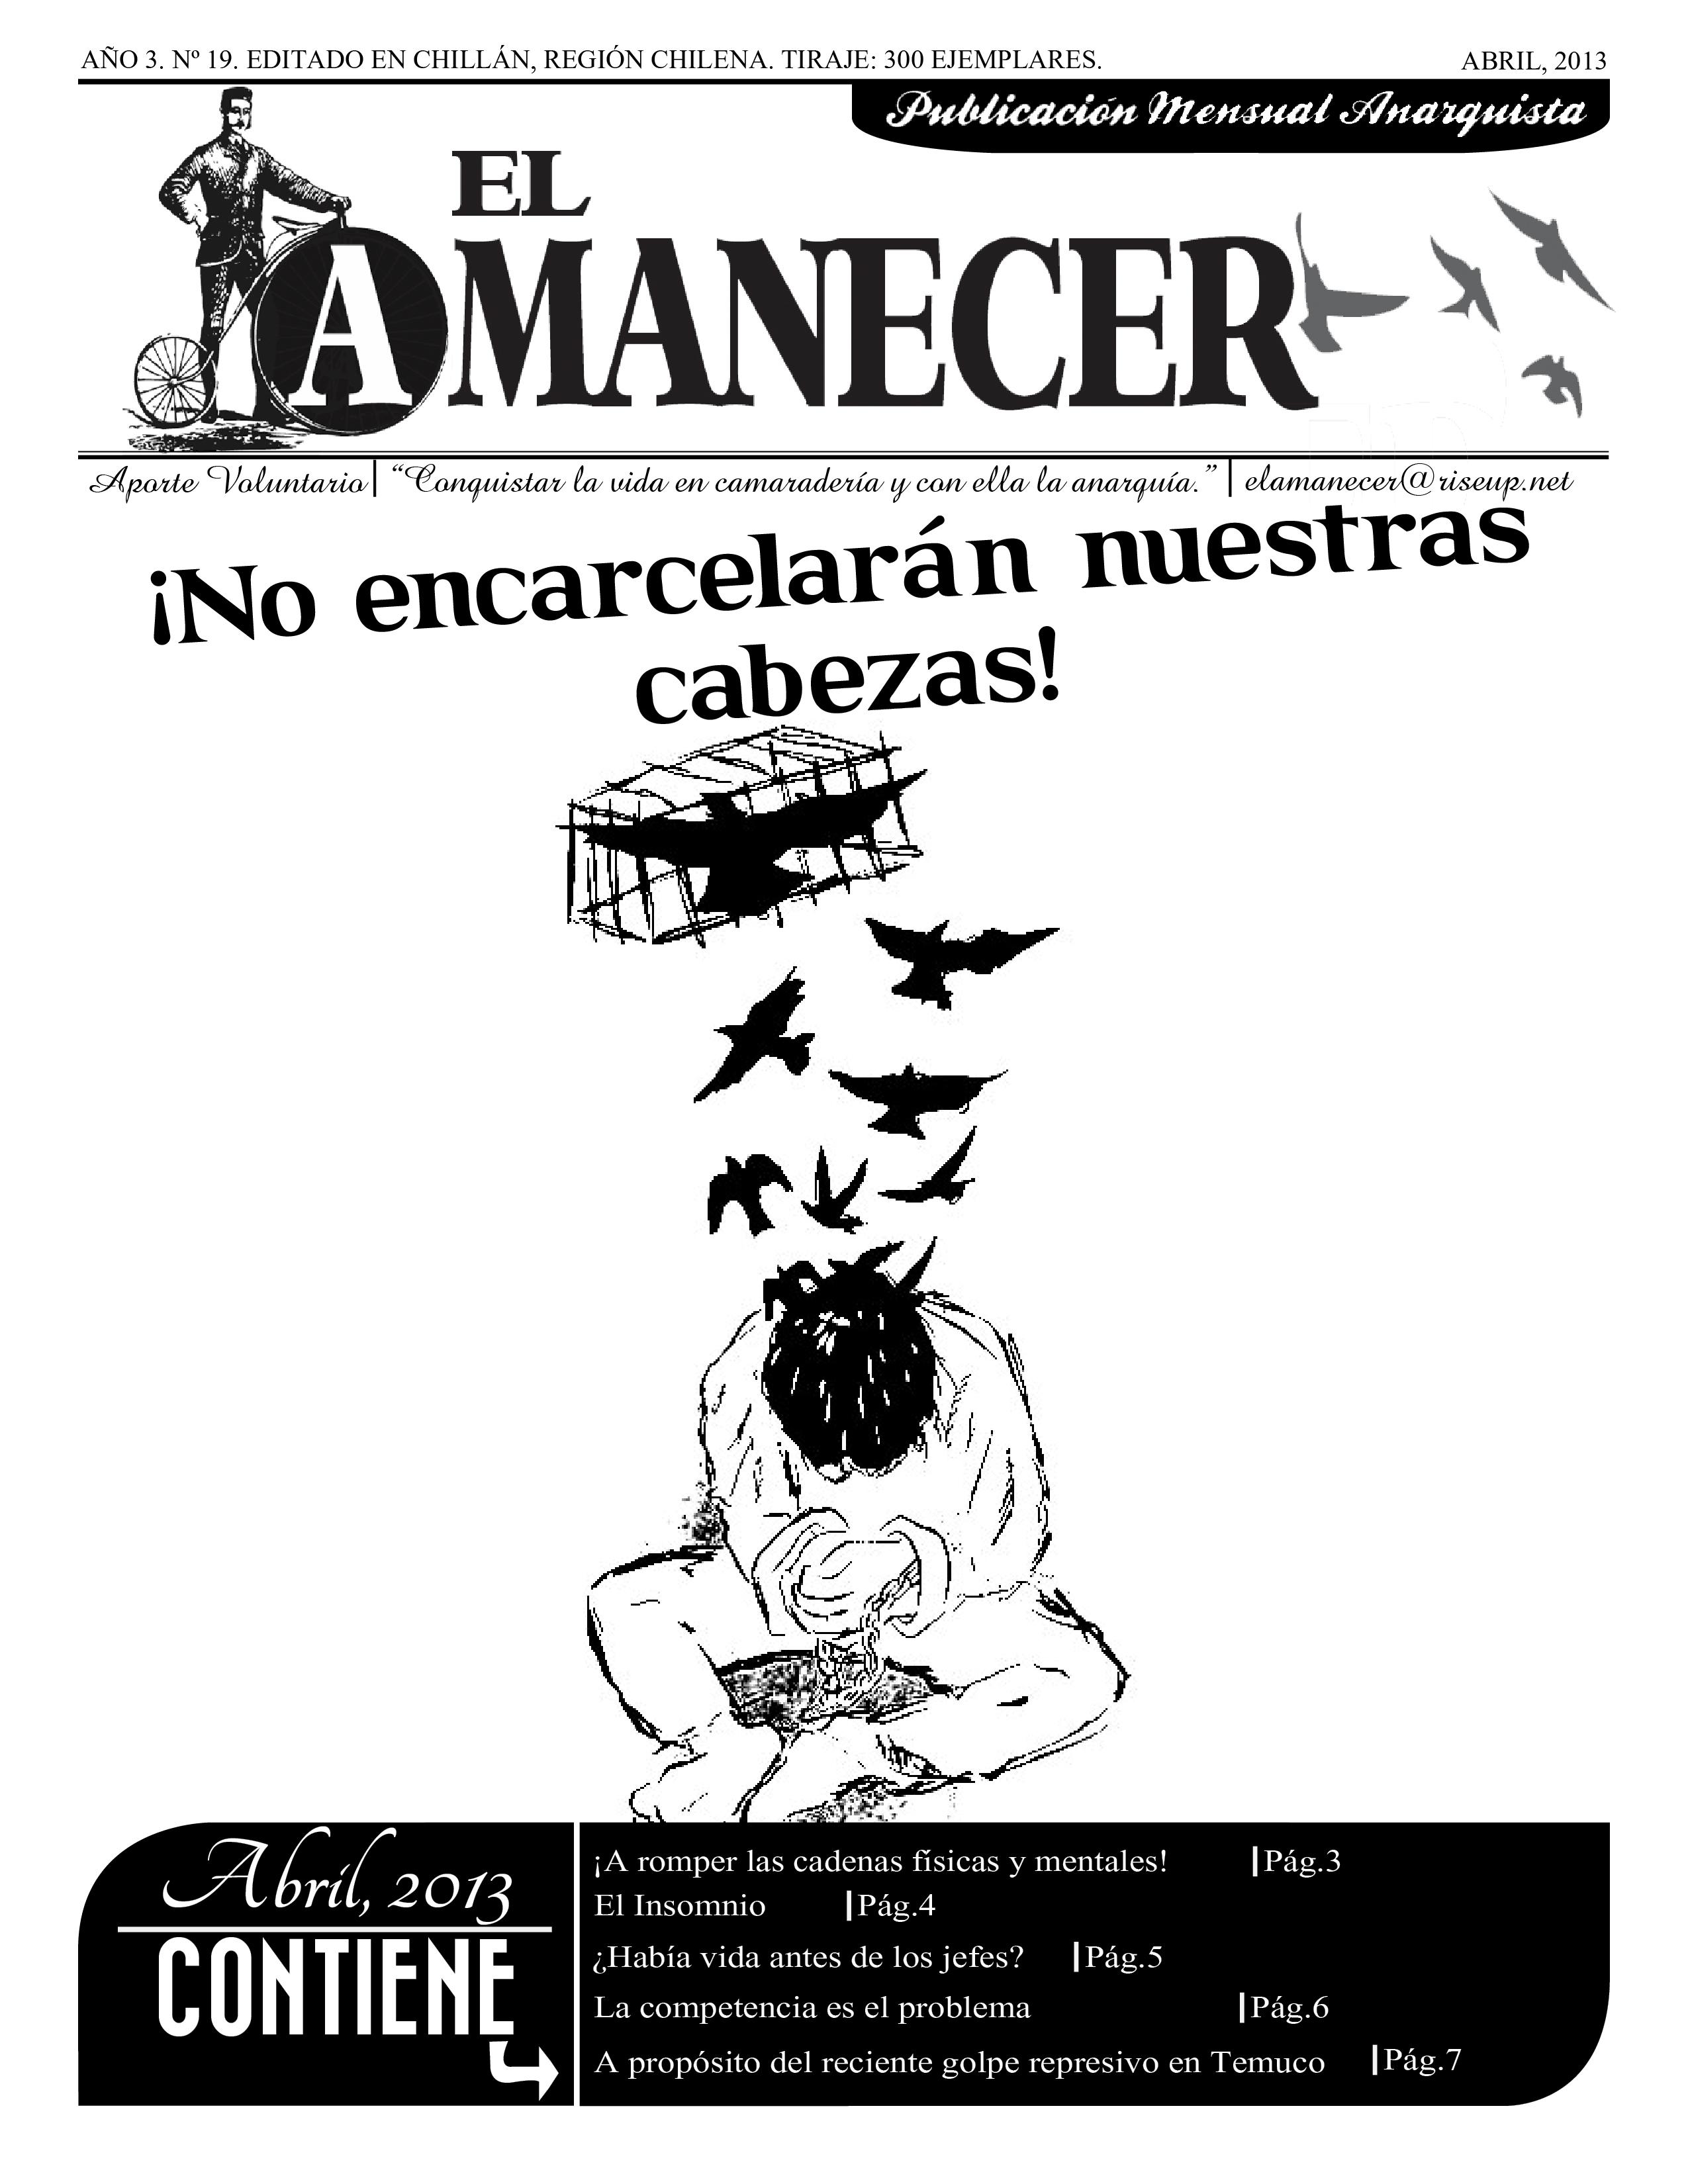 https://periodicoelamanecer.files.wordpress.com/2013/04/periodico-anarquista-el-amanecer-abril-2013-portada.jpg